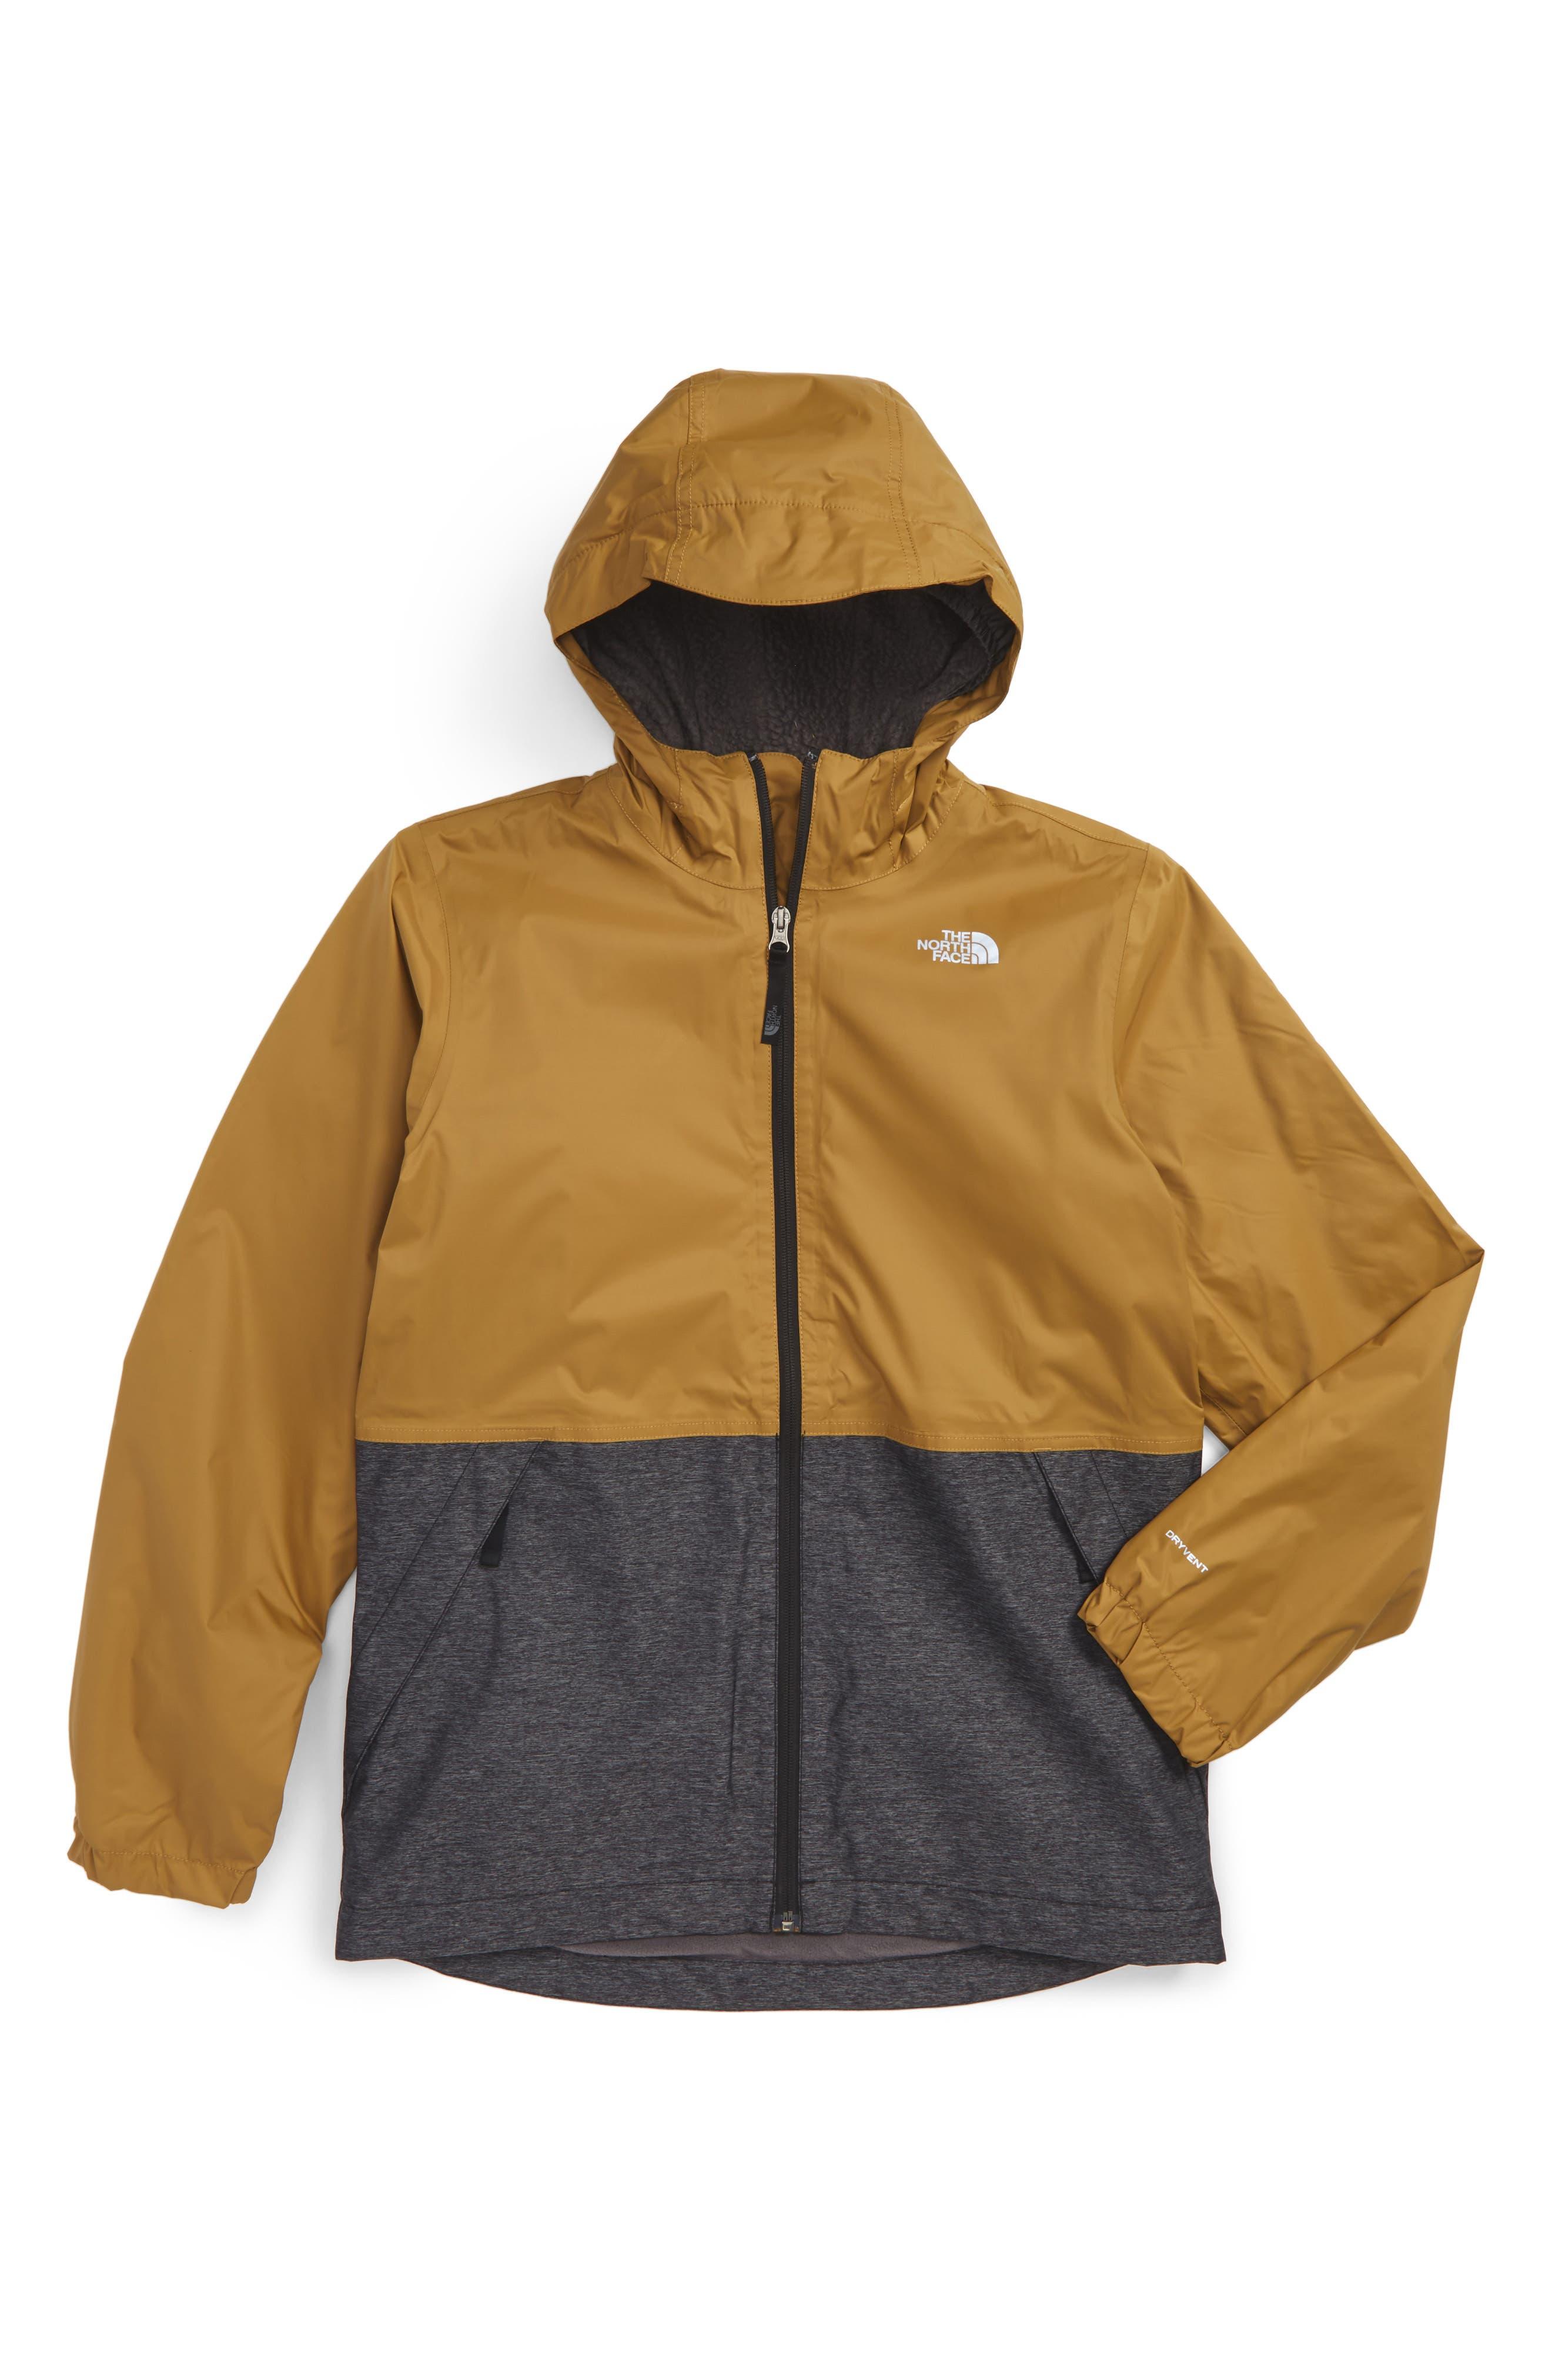 Main Image - The North Face Warm Storm Hooded Waterproof Jacket (Big Boys)